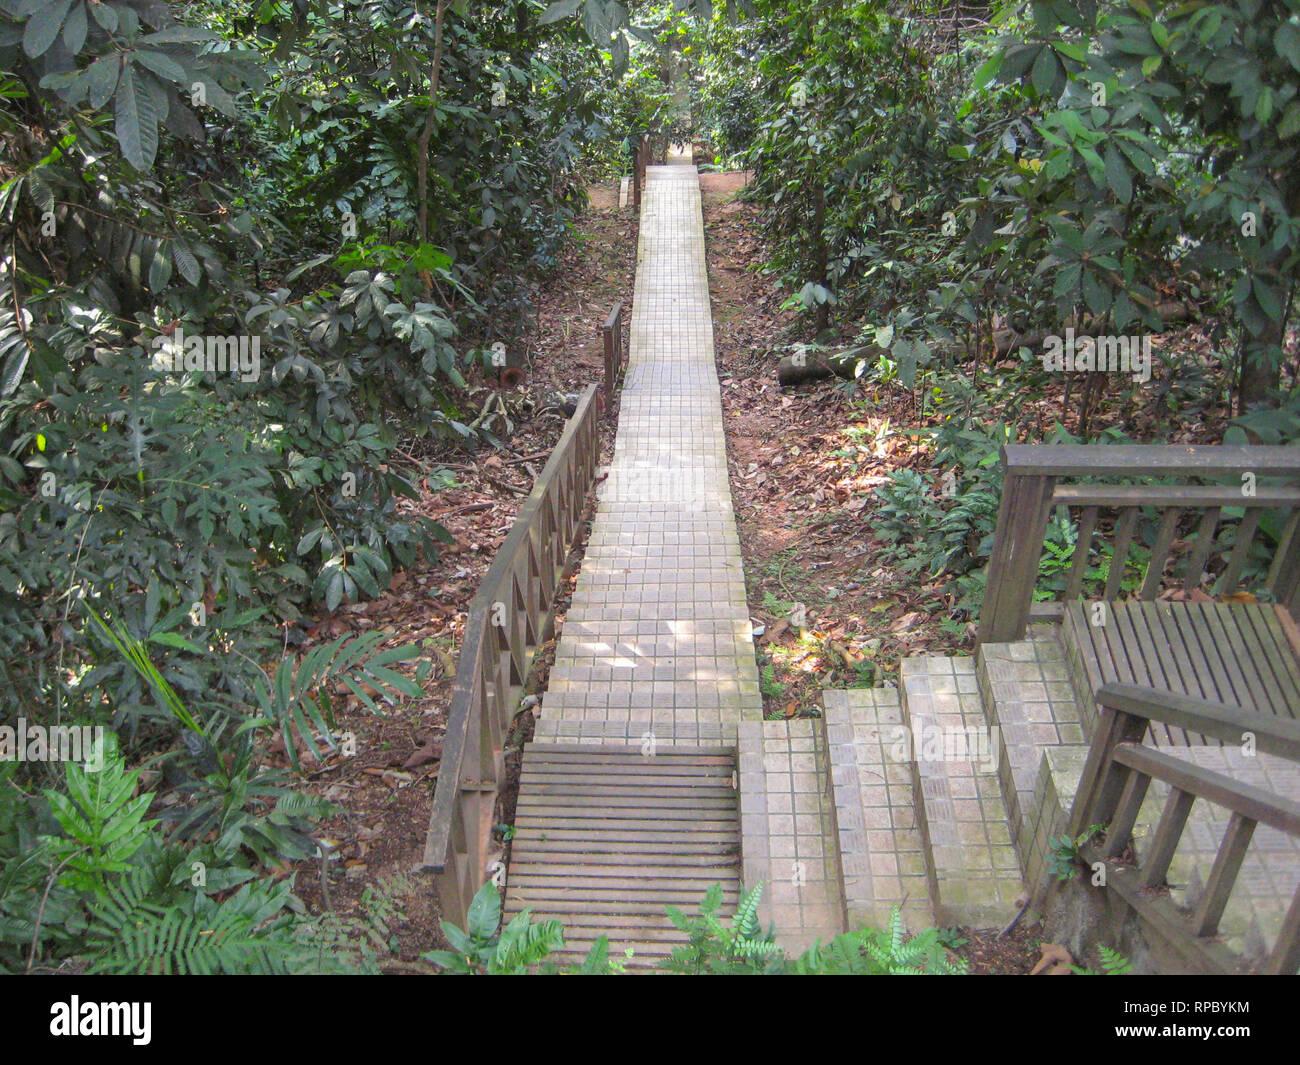 Trail through the jungle at KL tower, Kuala Lumpur, Malaysia - Stock Image